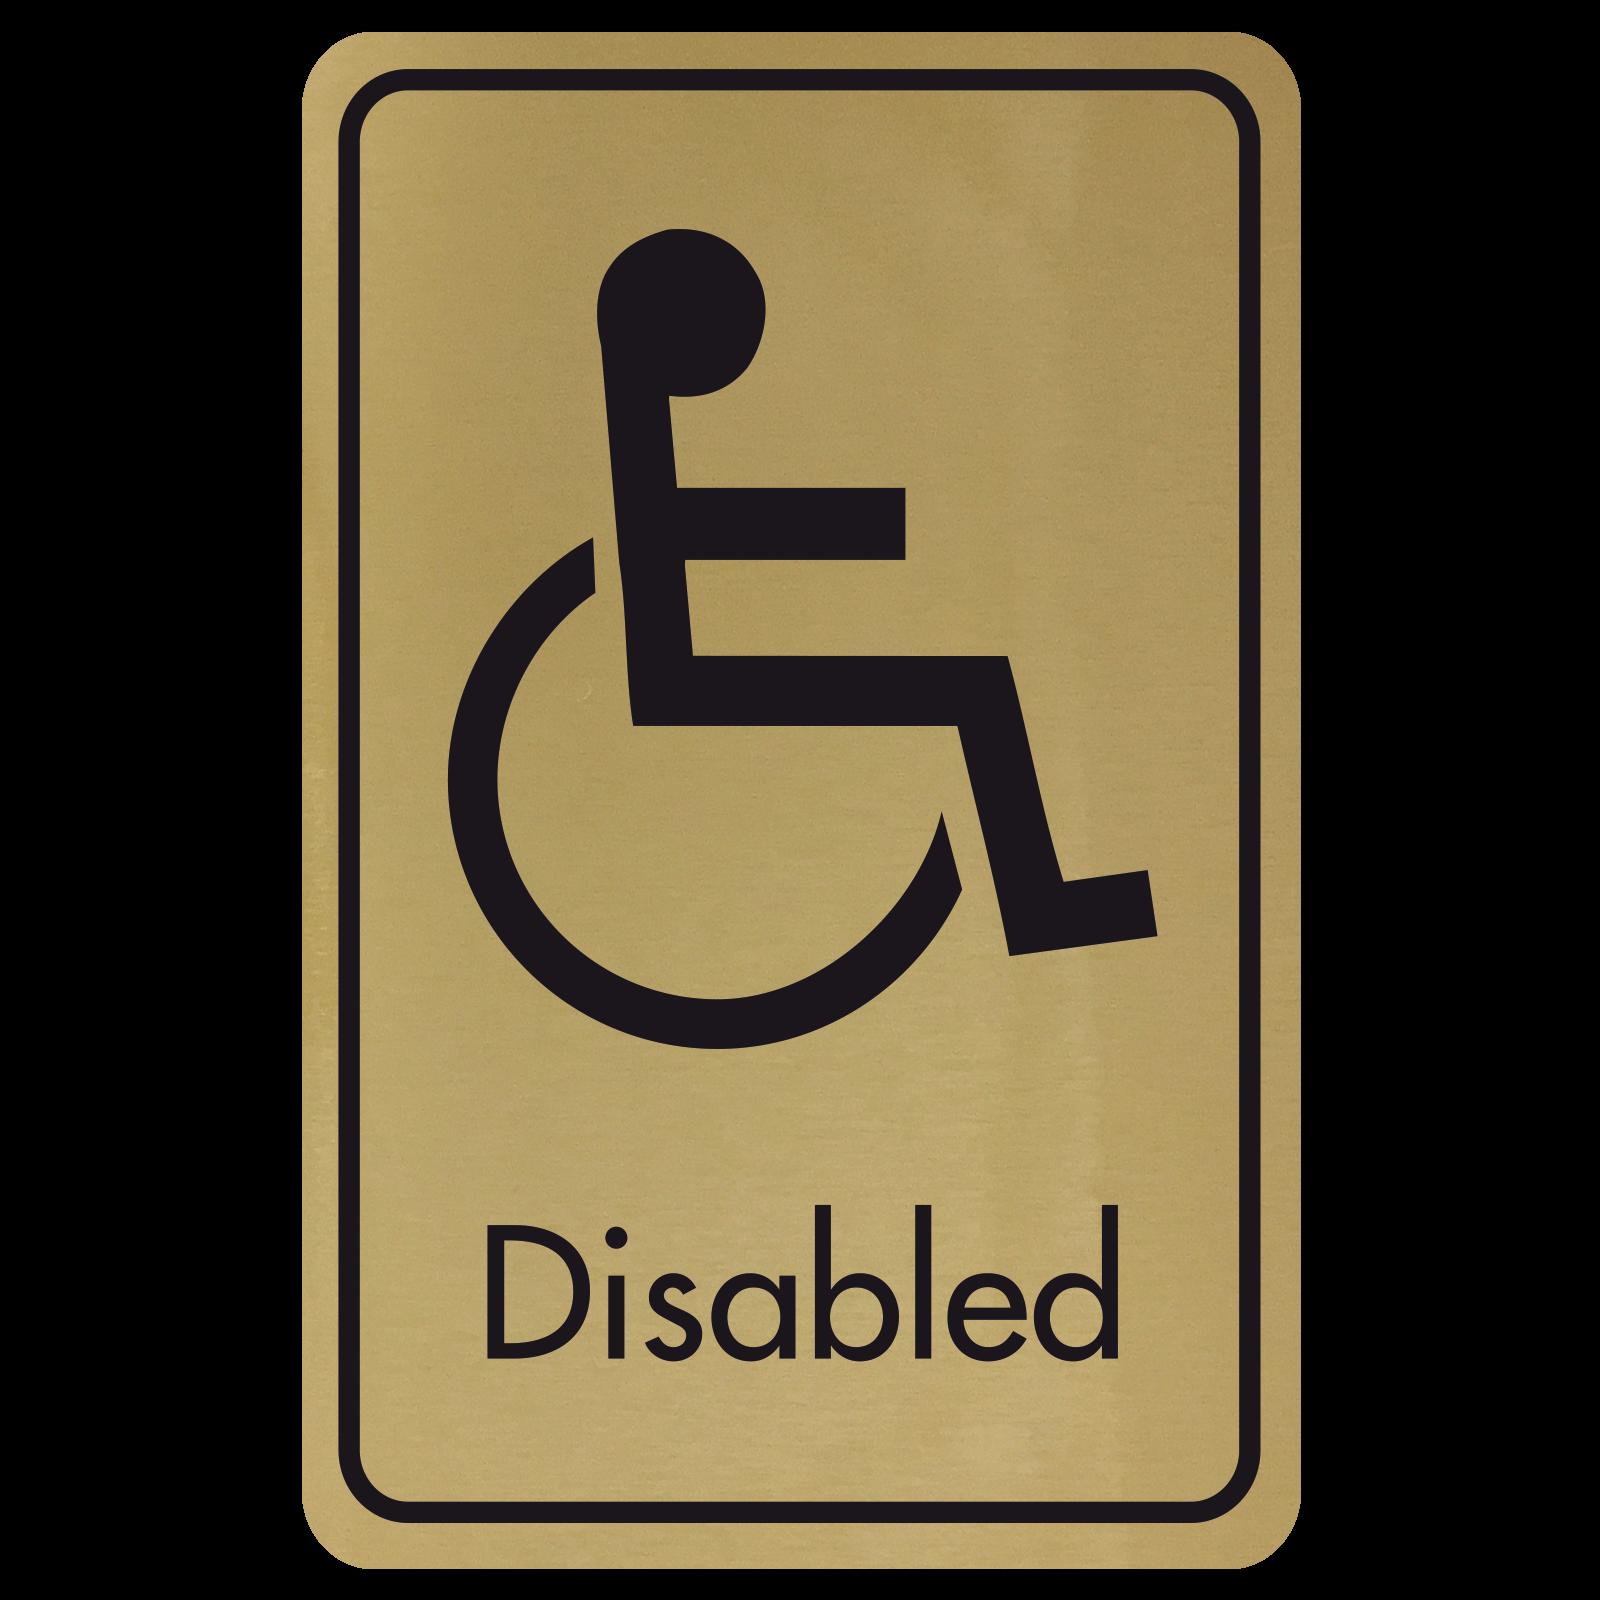 Large Disabled Door Sign - Black on Gold